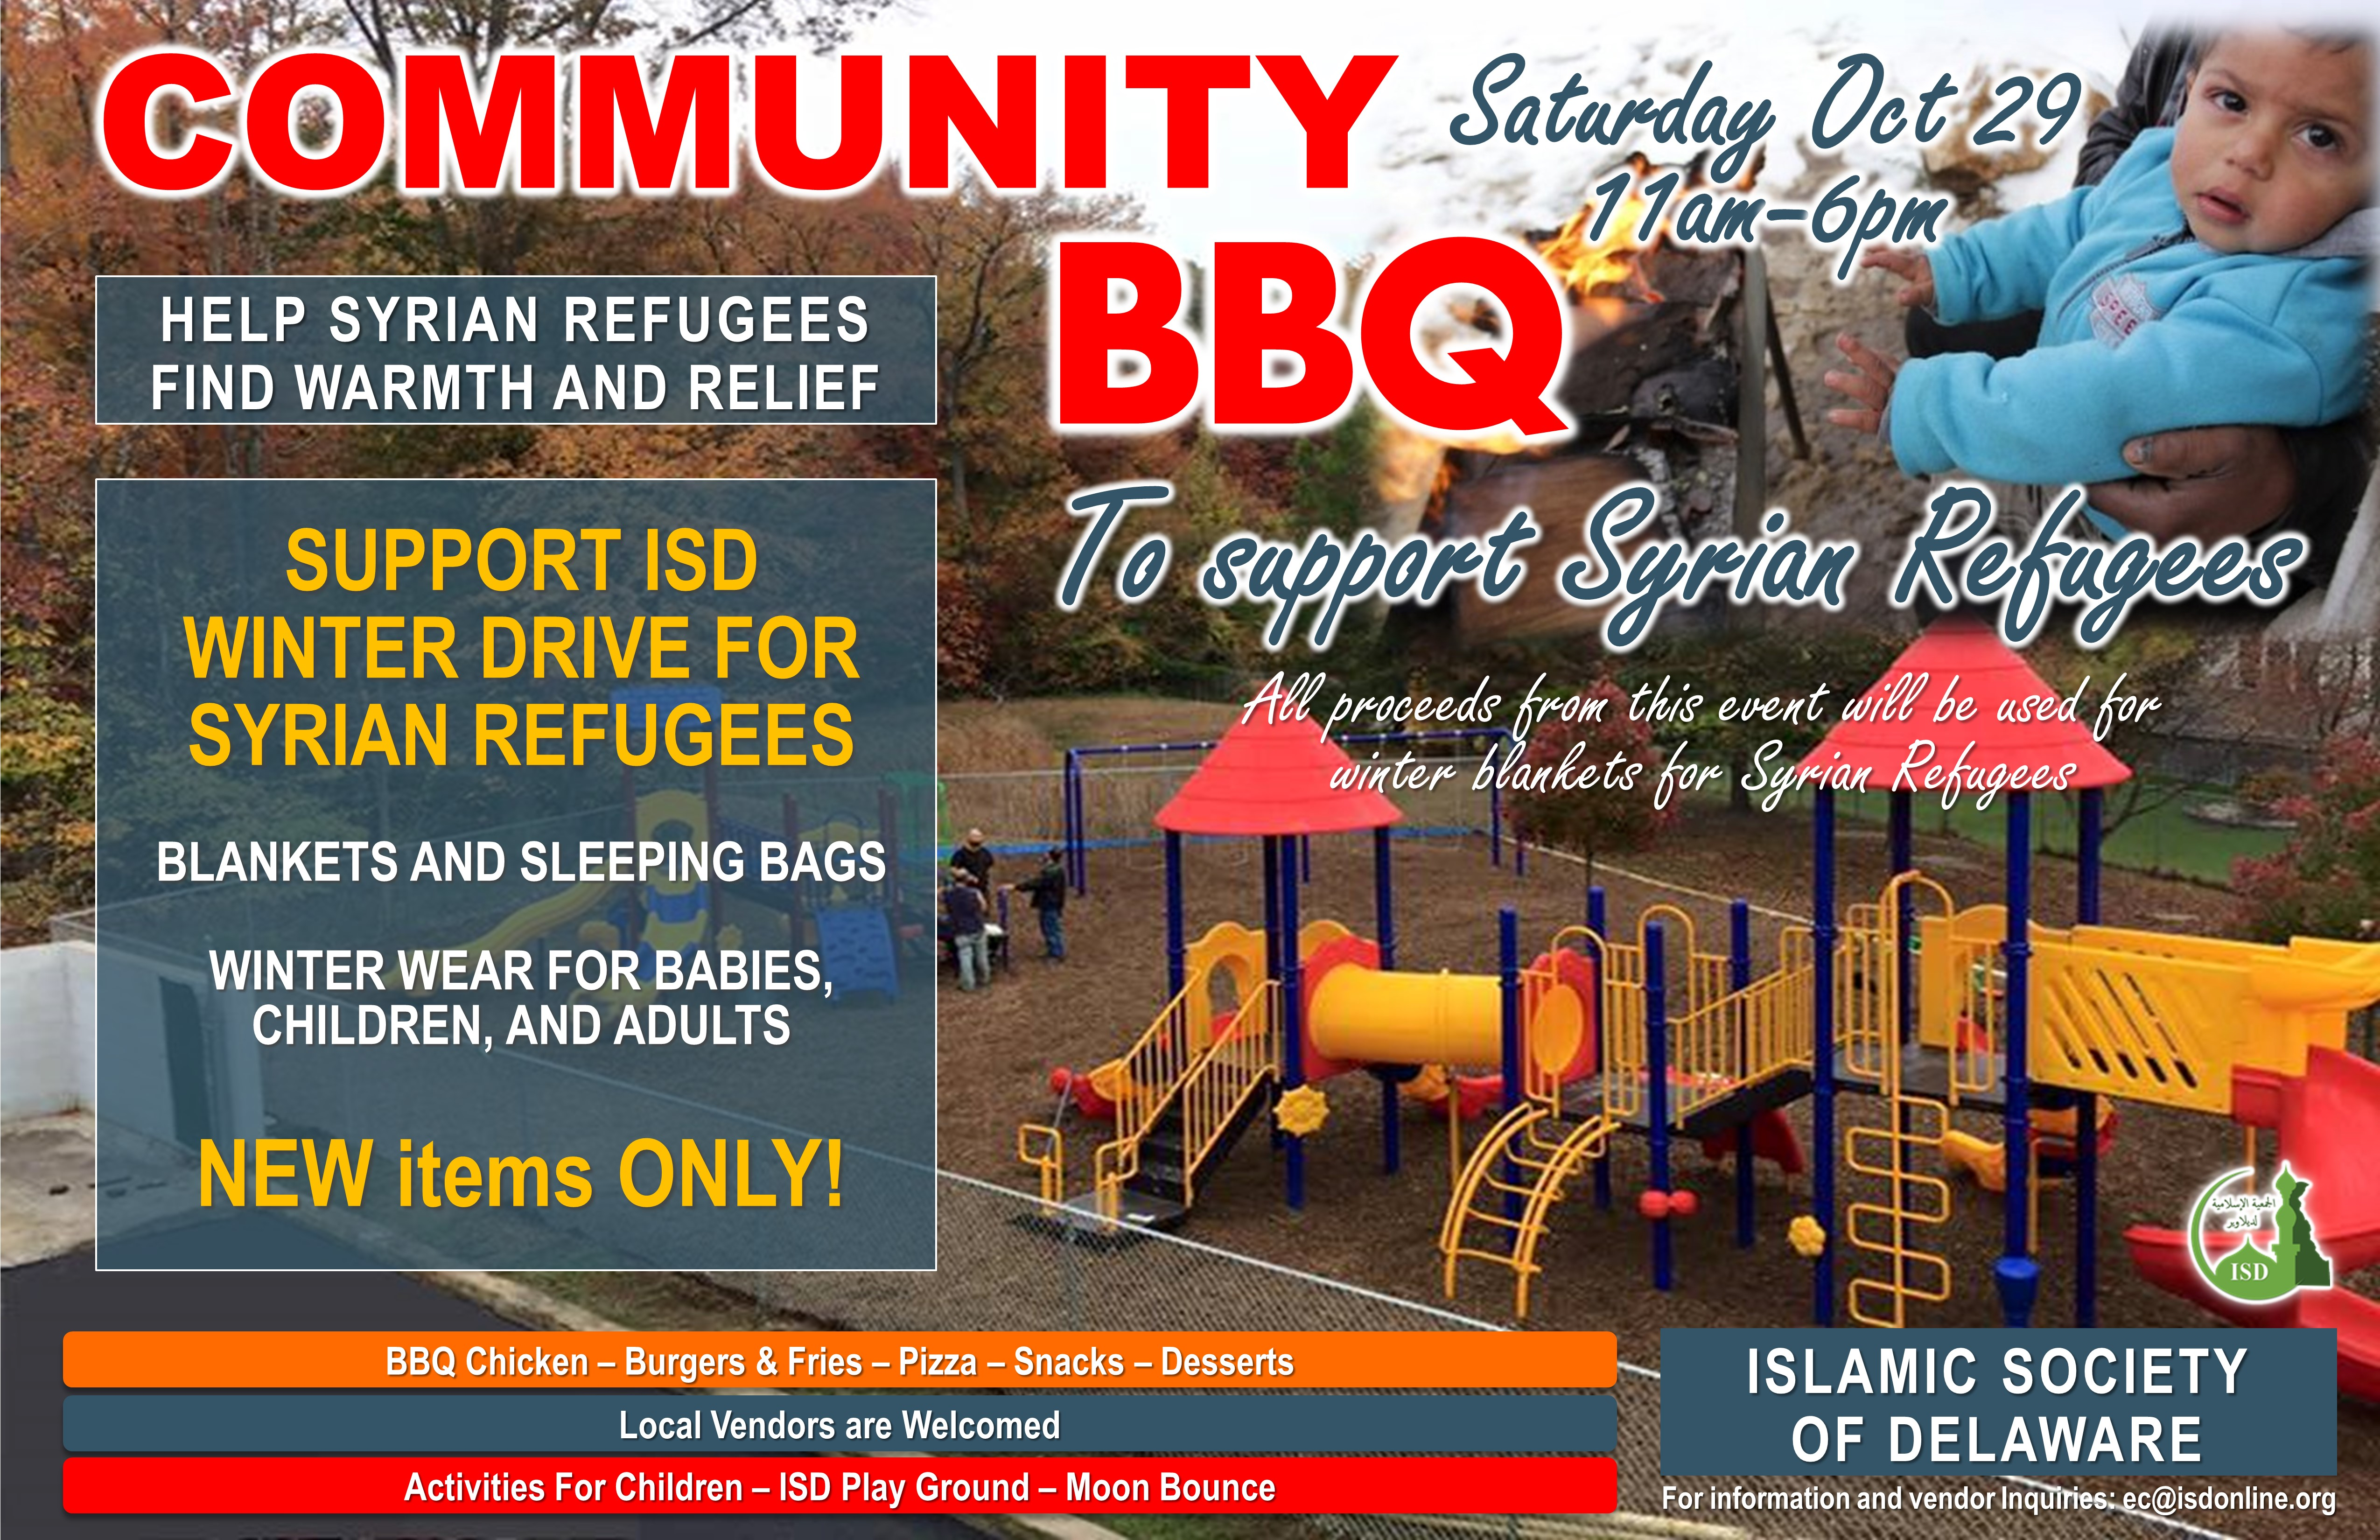 ISD-BBQ-Syria102916